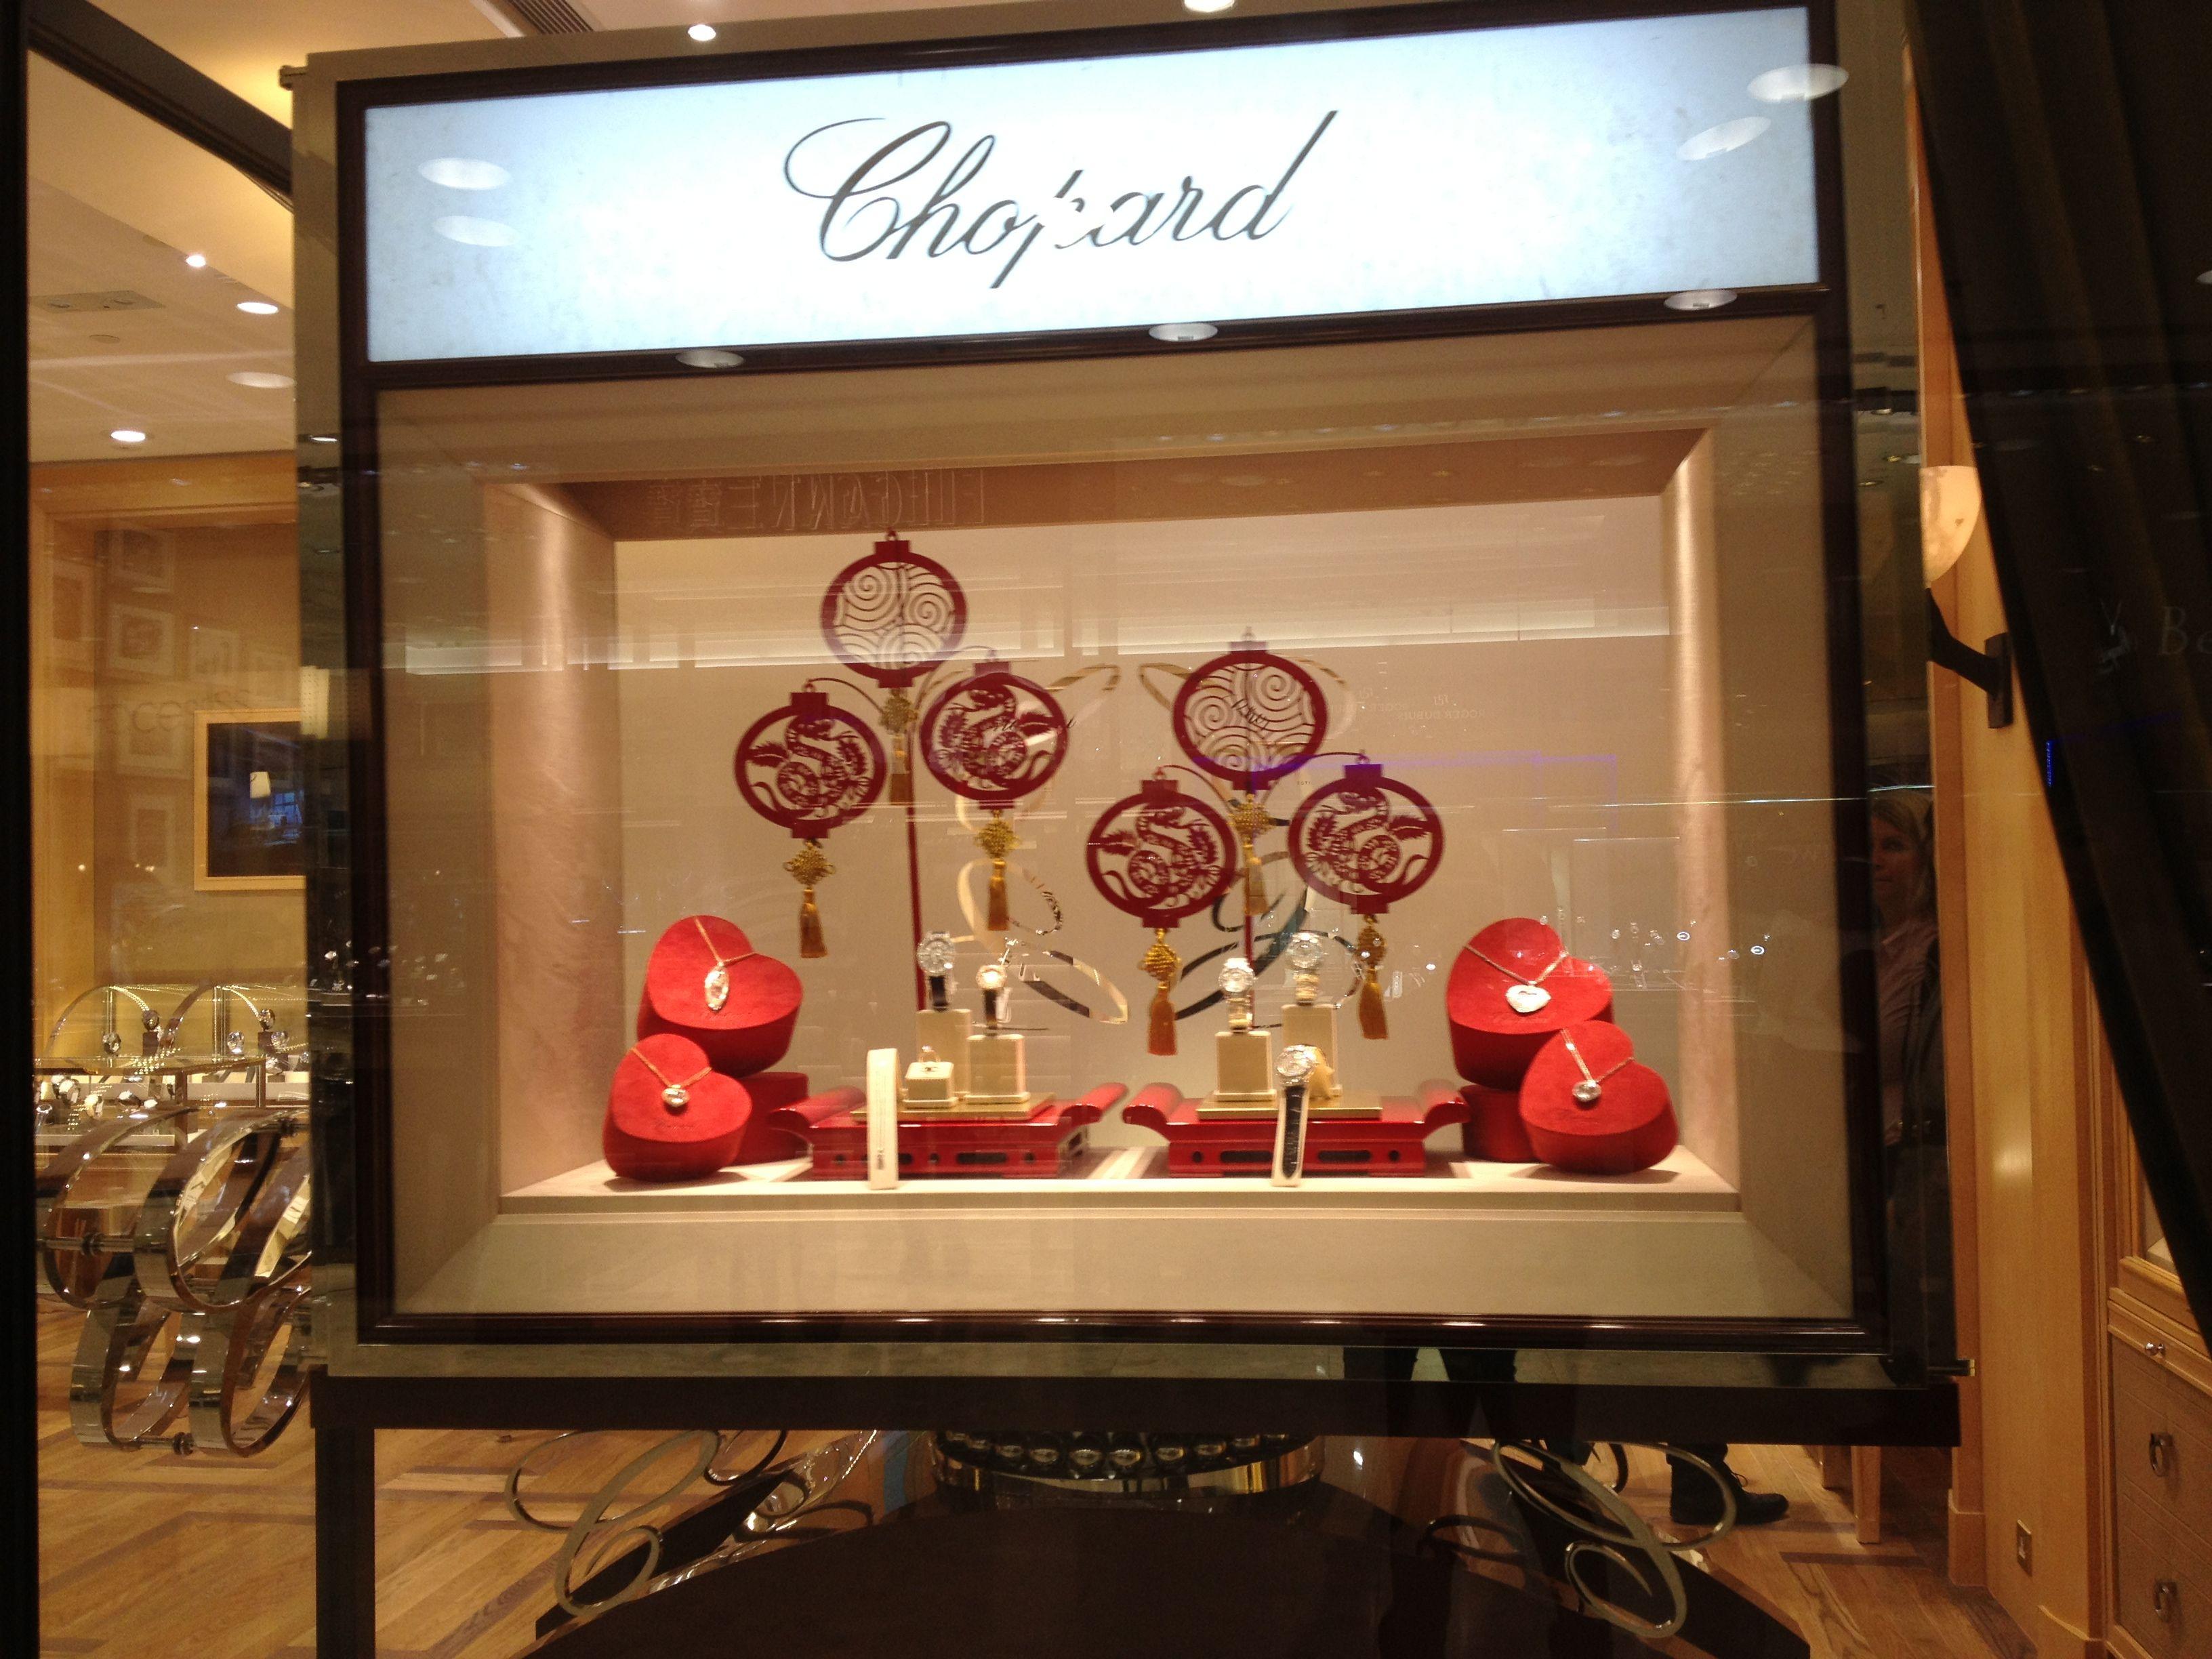 Chopard CNY window display Hong Kong Jan 2013